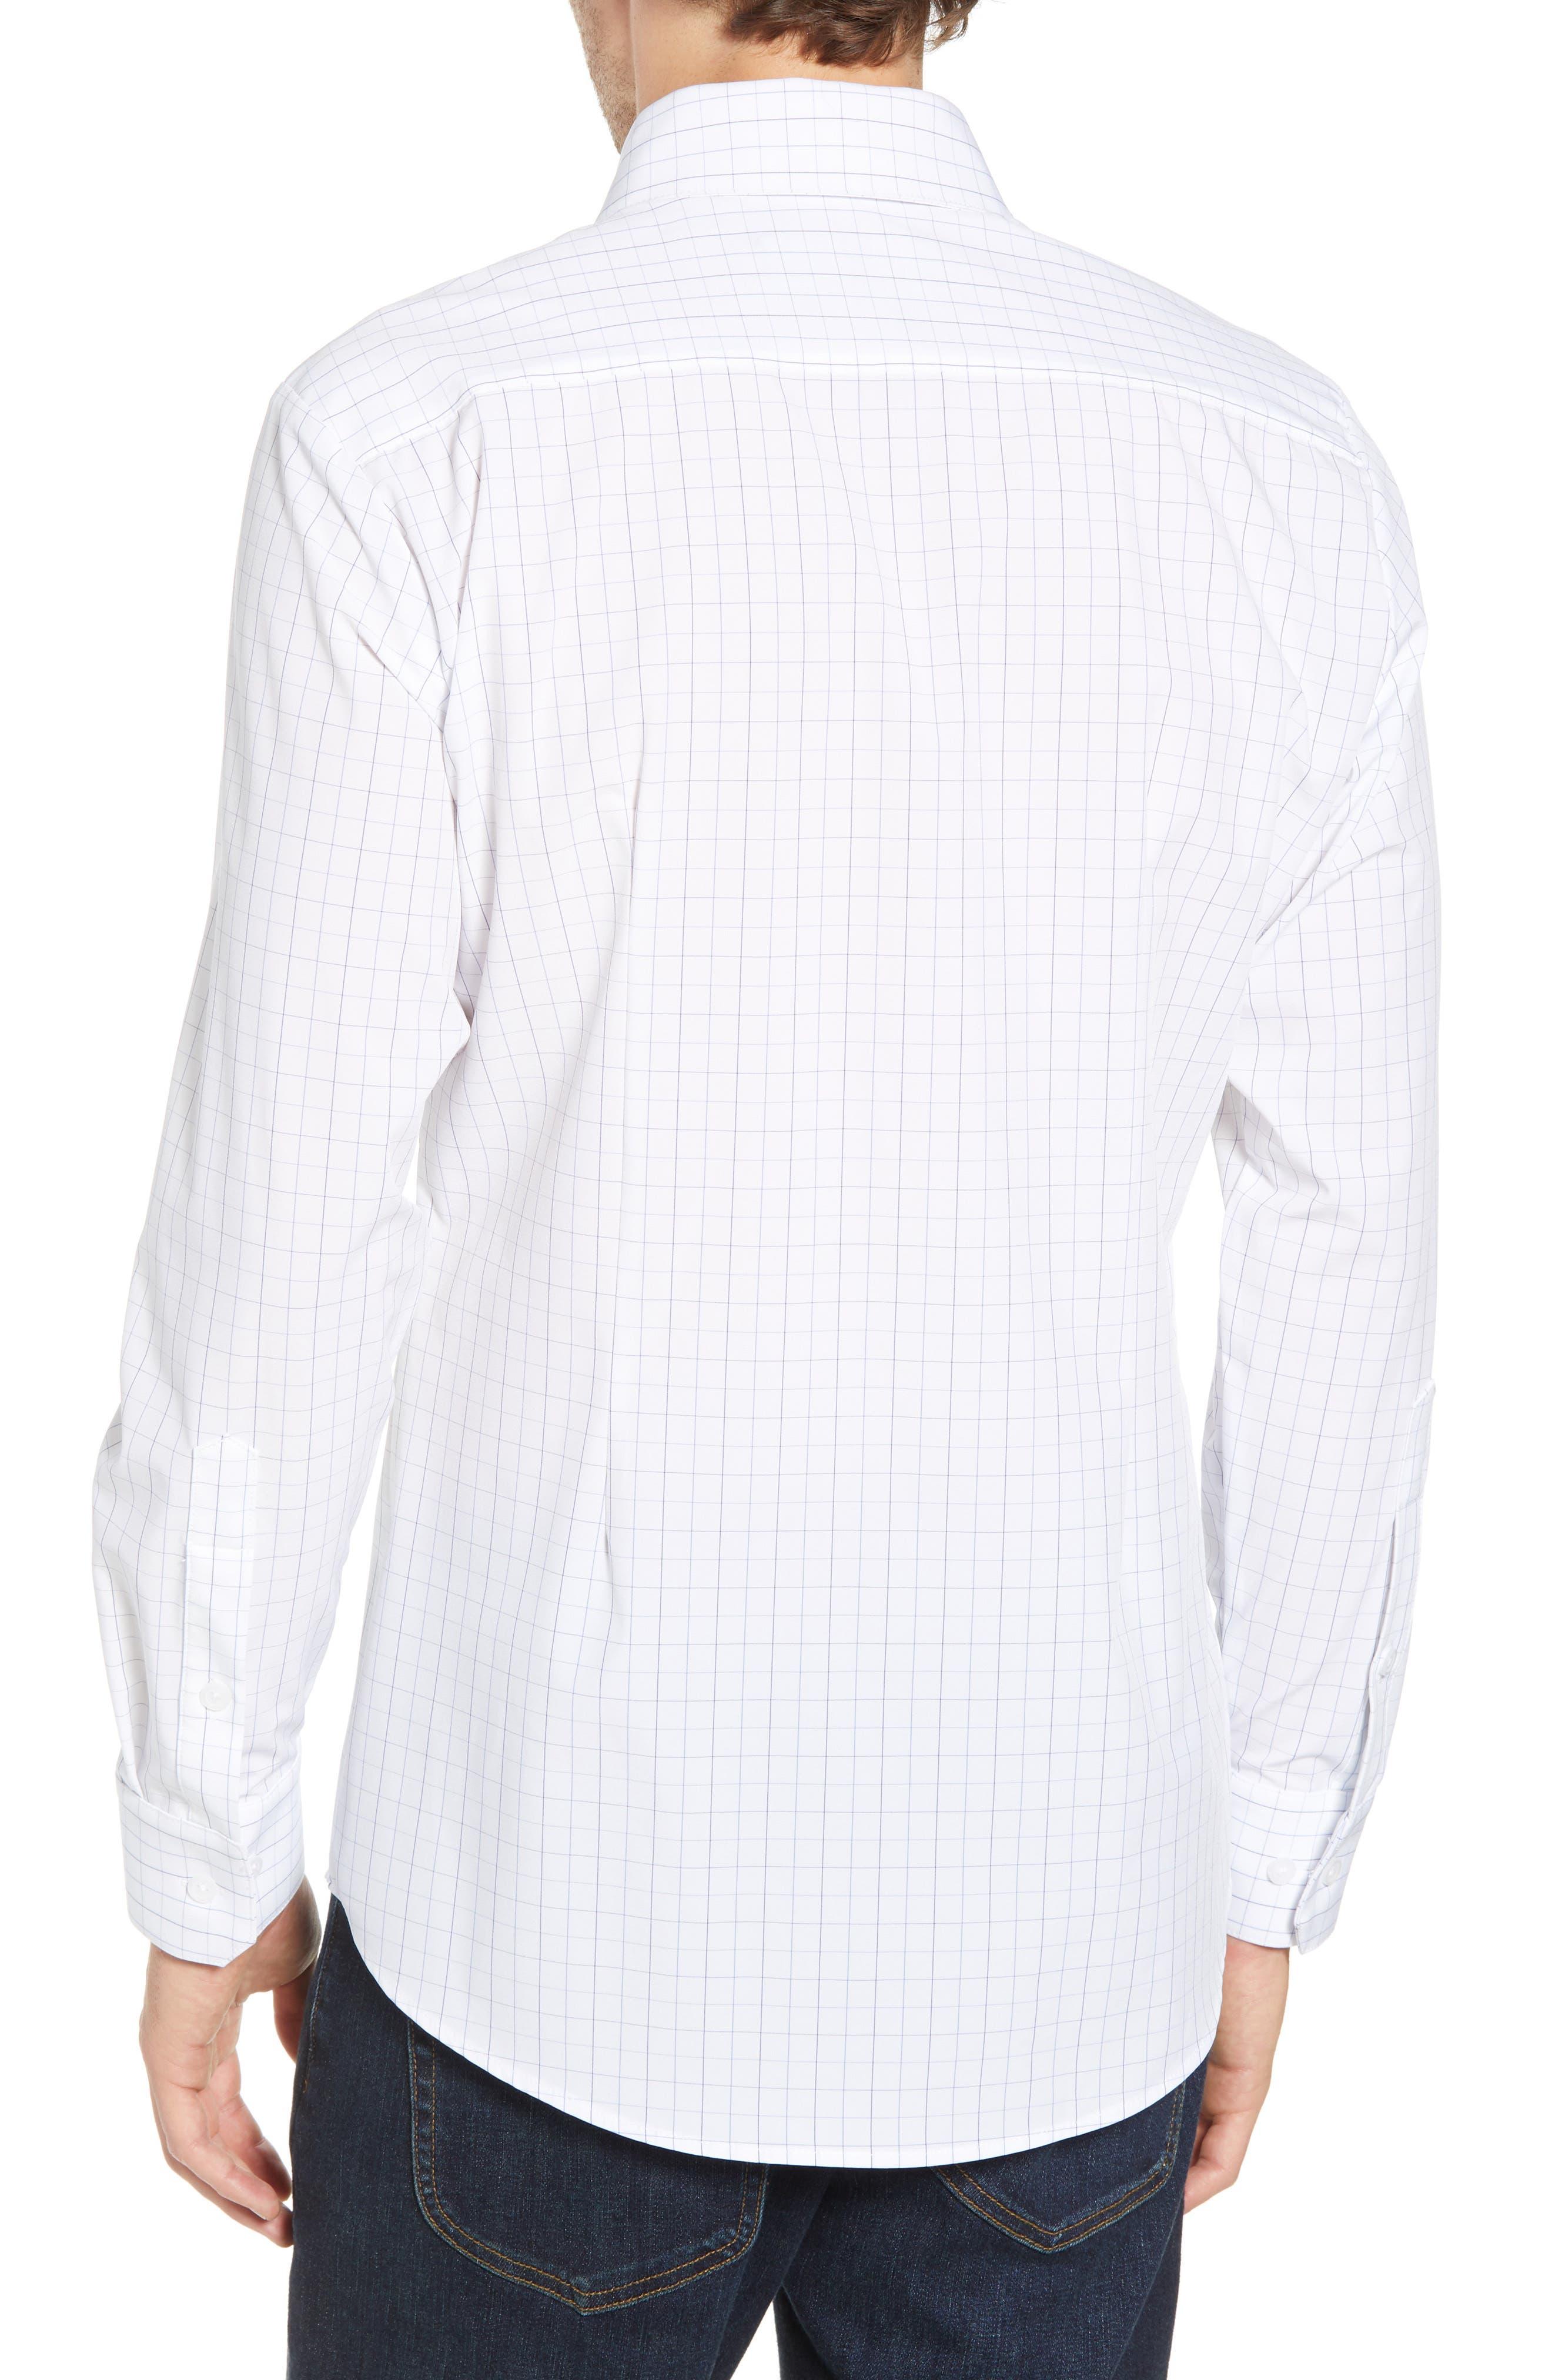 Buckner Slim Fit Grid Performance Sport Shirt,                             Alternate thumbnail 2, color,                             400